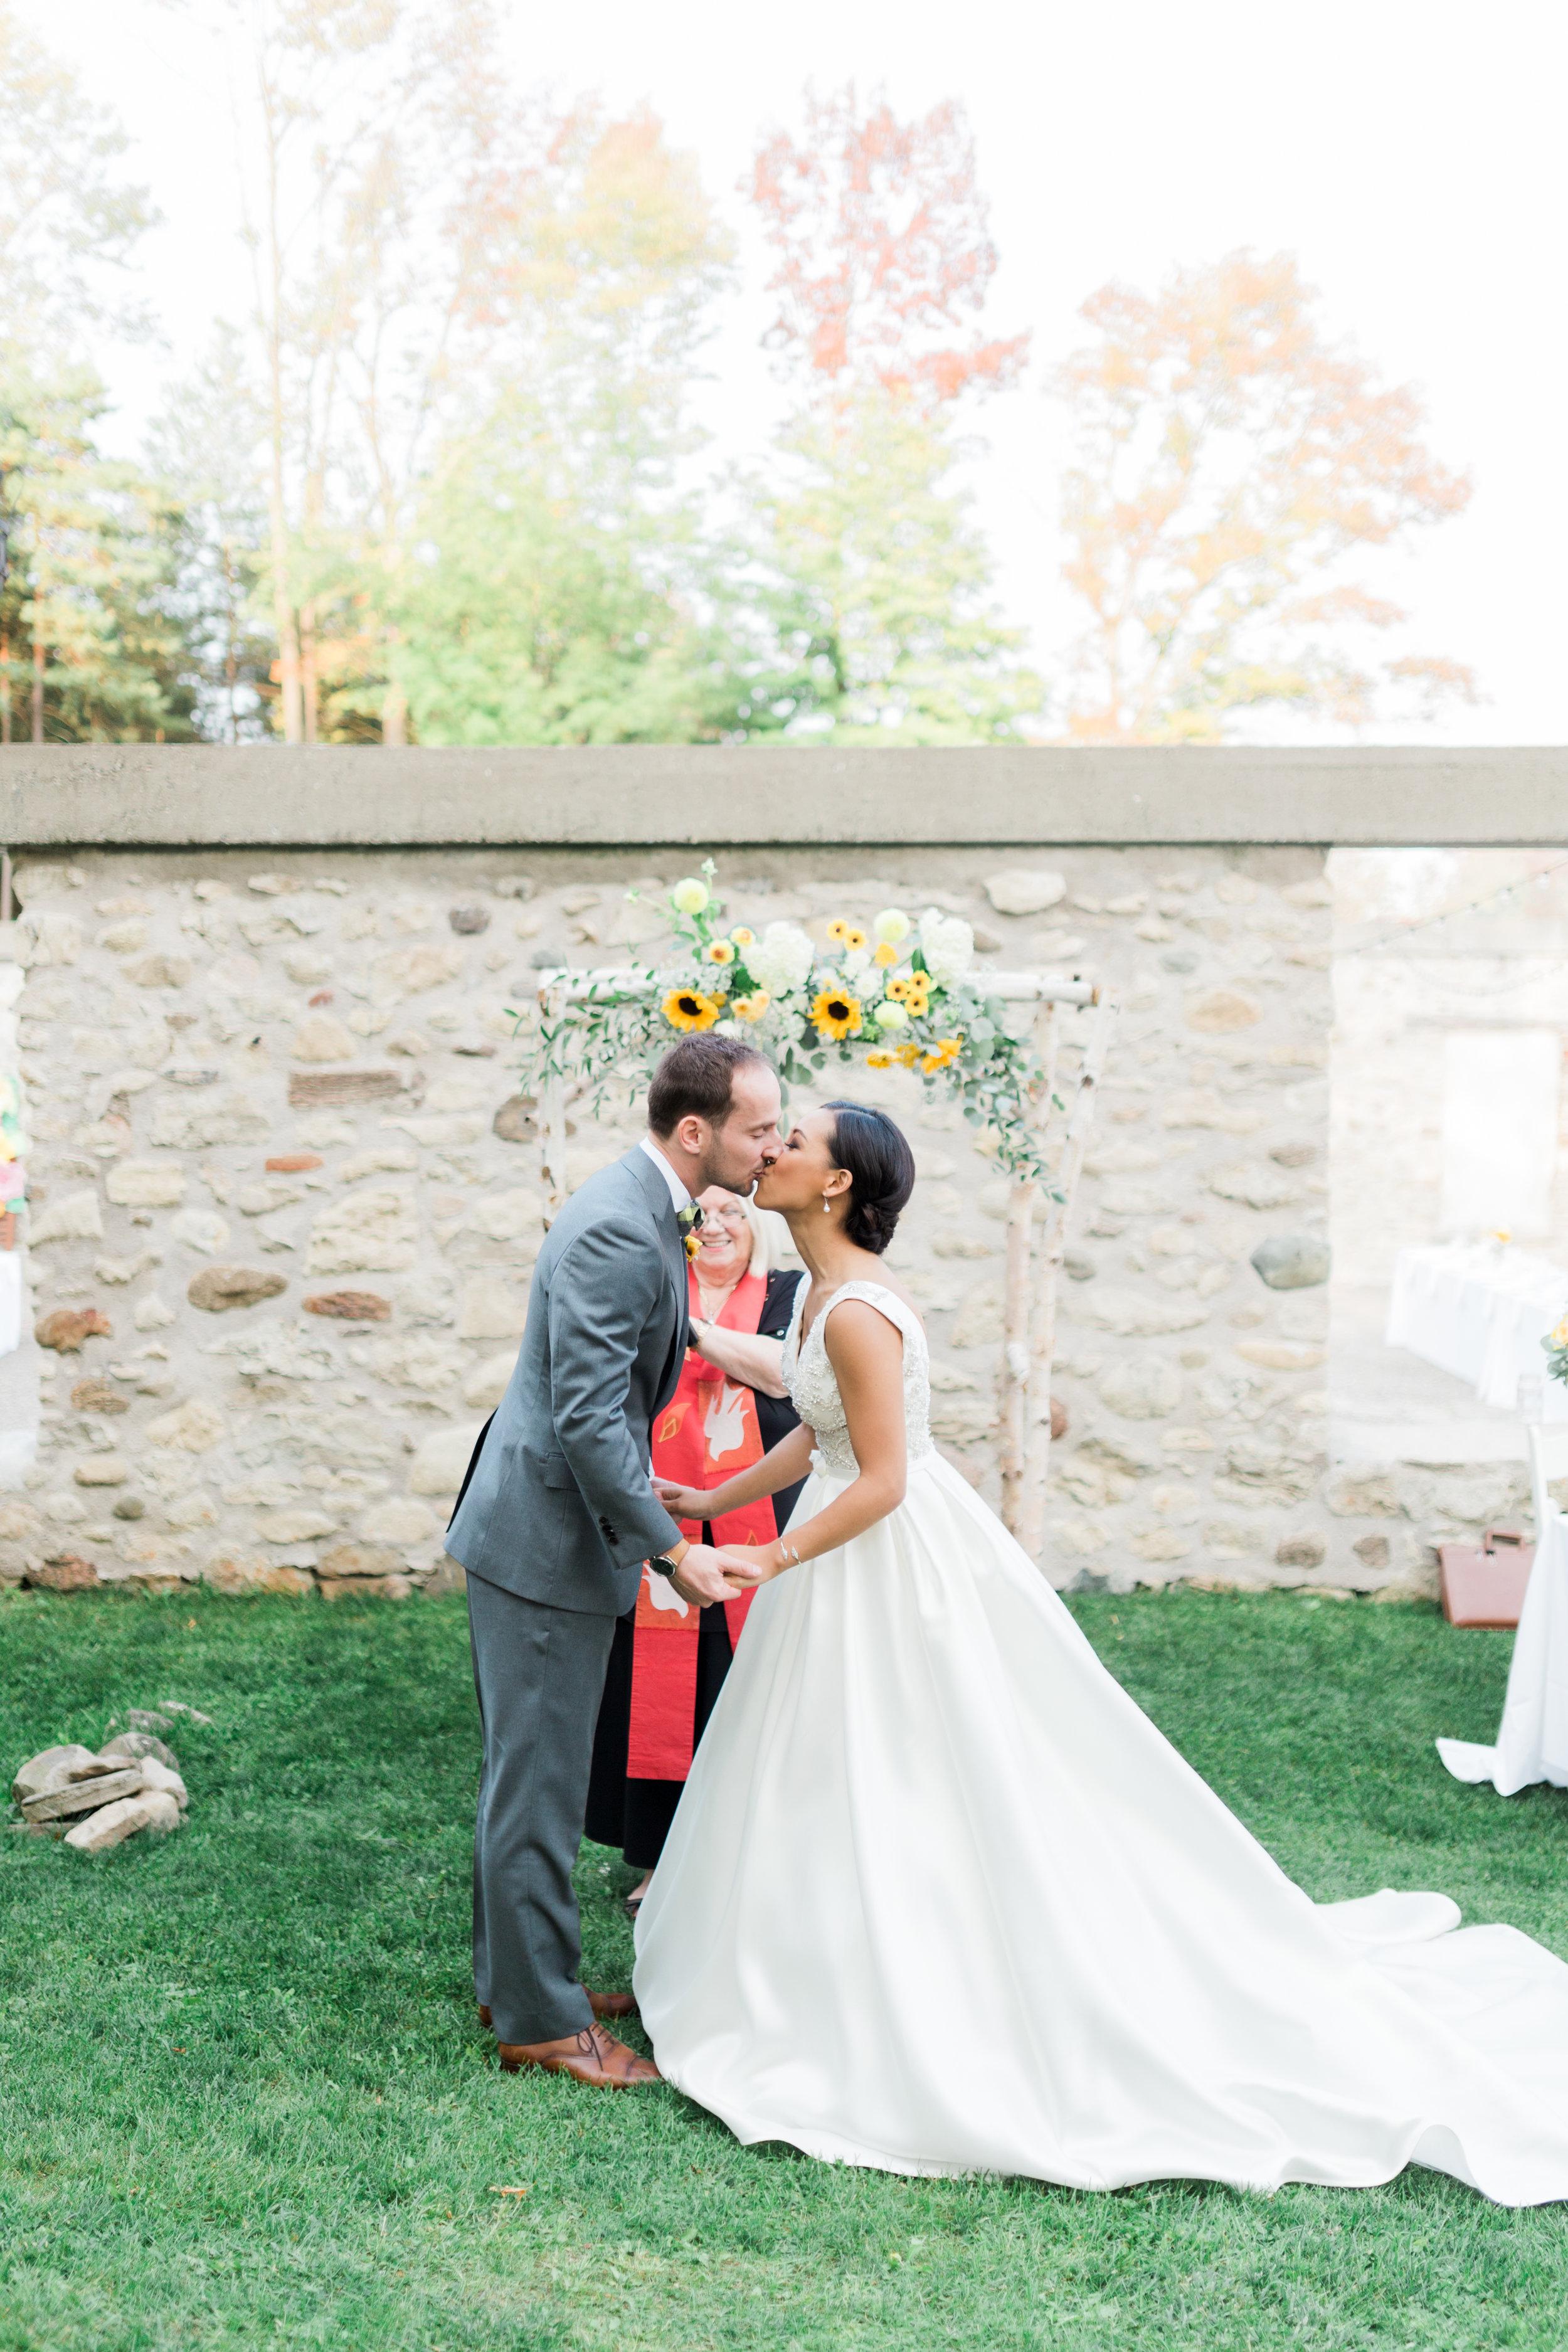 Alton Mills Wedding - Ceremony-62.jpg